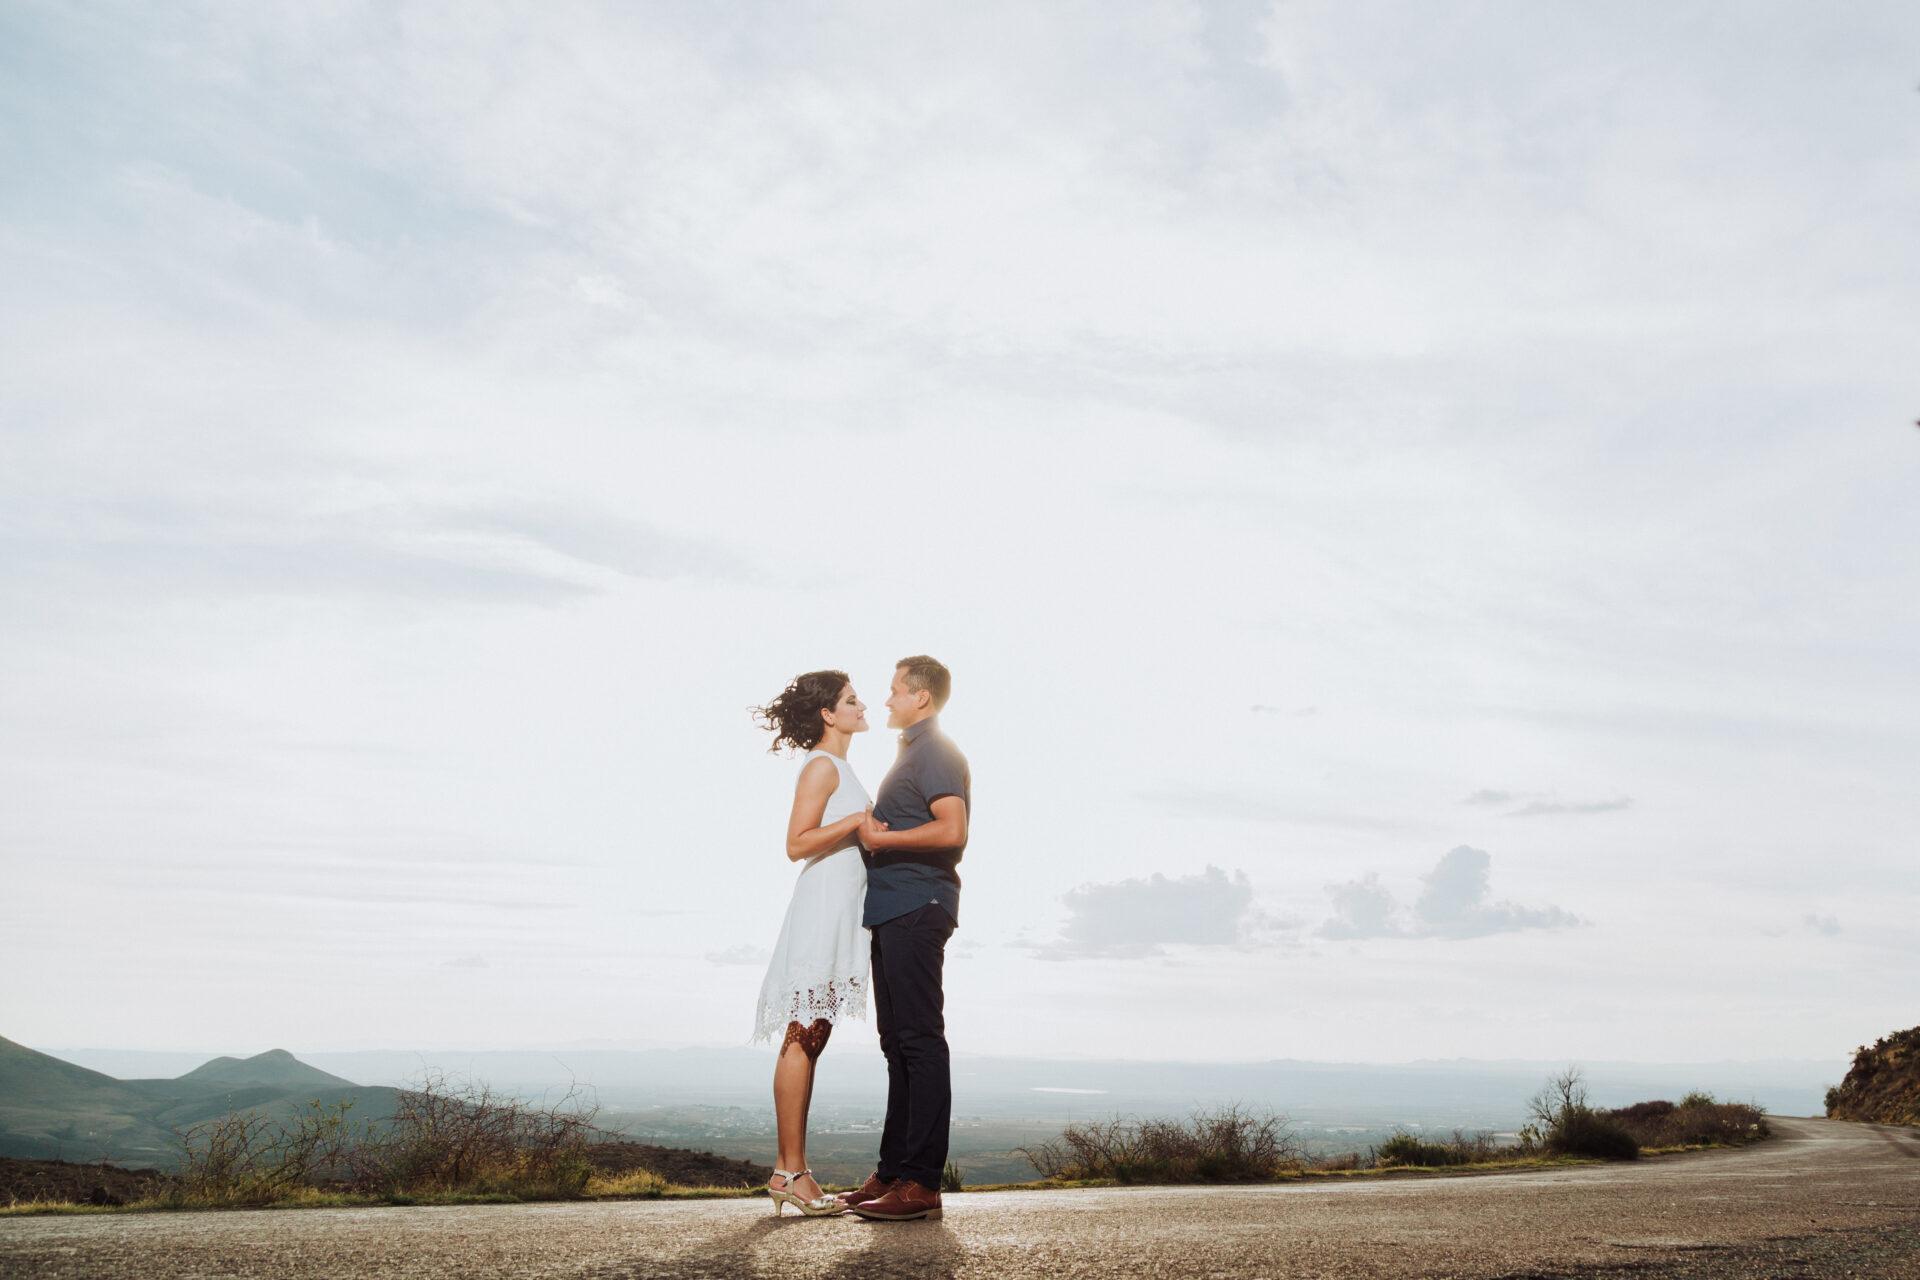 javier_noriega_fotografo_save_the_date_zacatecas_wedding_photographer10